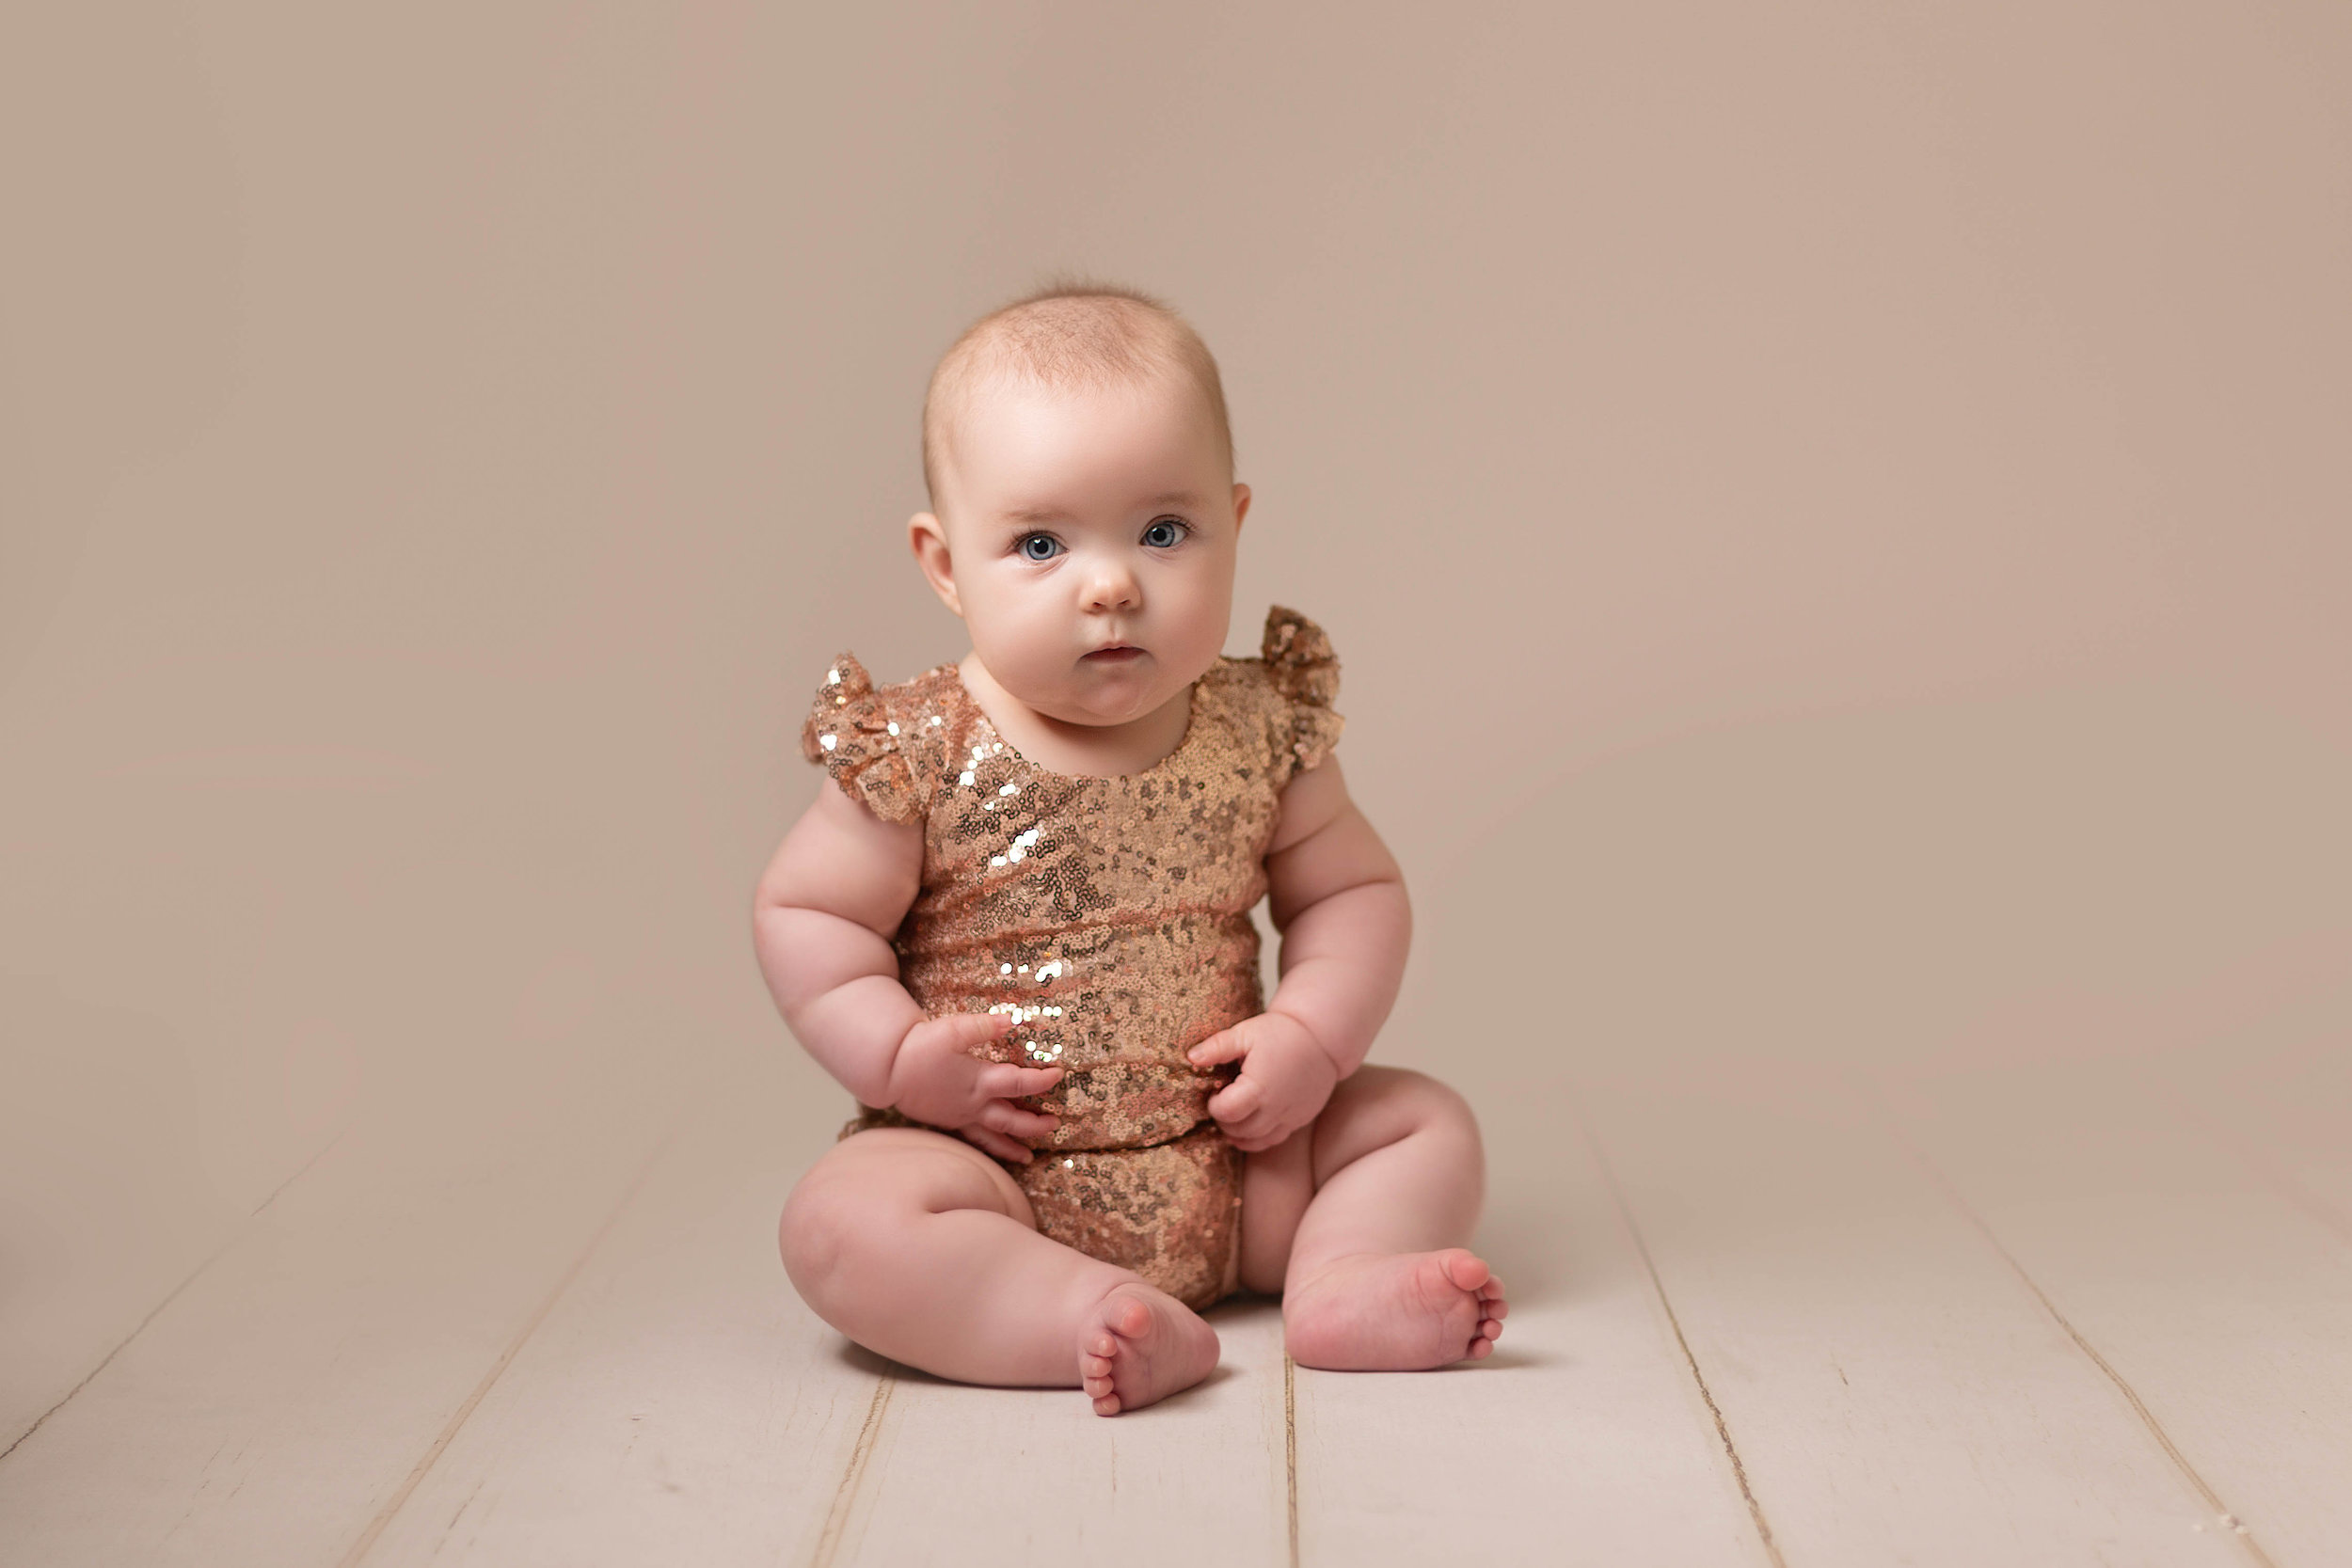 LEA-COOPER-PHOTOGRAPHY-CHILD-PHOTOGRAPHY-WILLENHALL-CHILDREN-PHOTOGRAPHER-WOLVERHAMPTON-BILSTON-WEDNESBURY-KIDS-PHOTOGRAPHER-SITTER-SESSION-MILESTONE--3.JPG